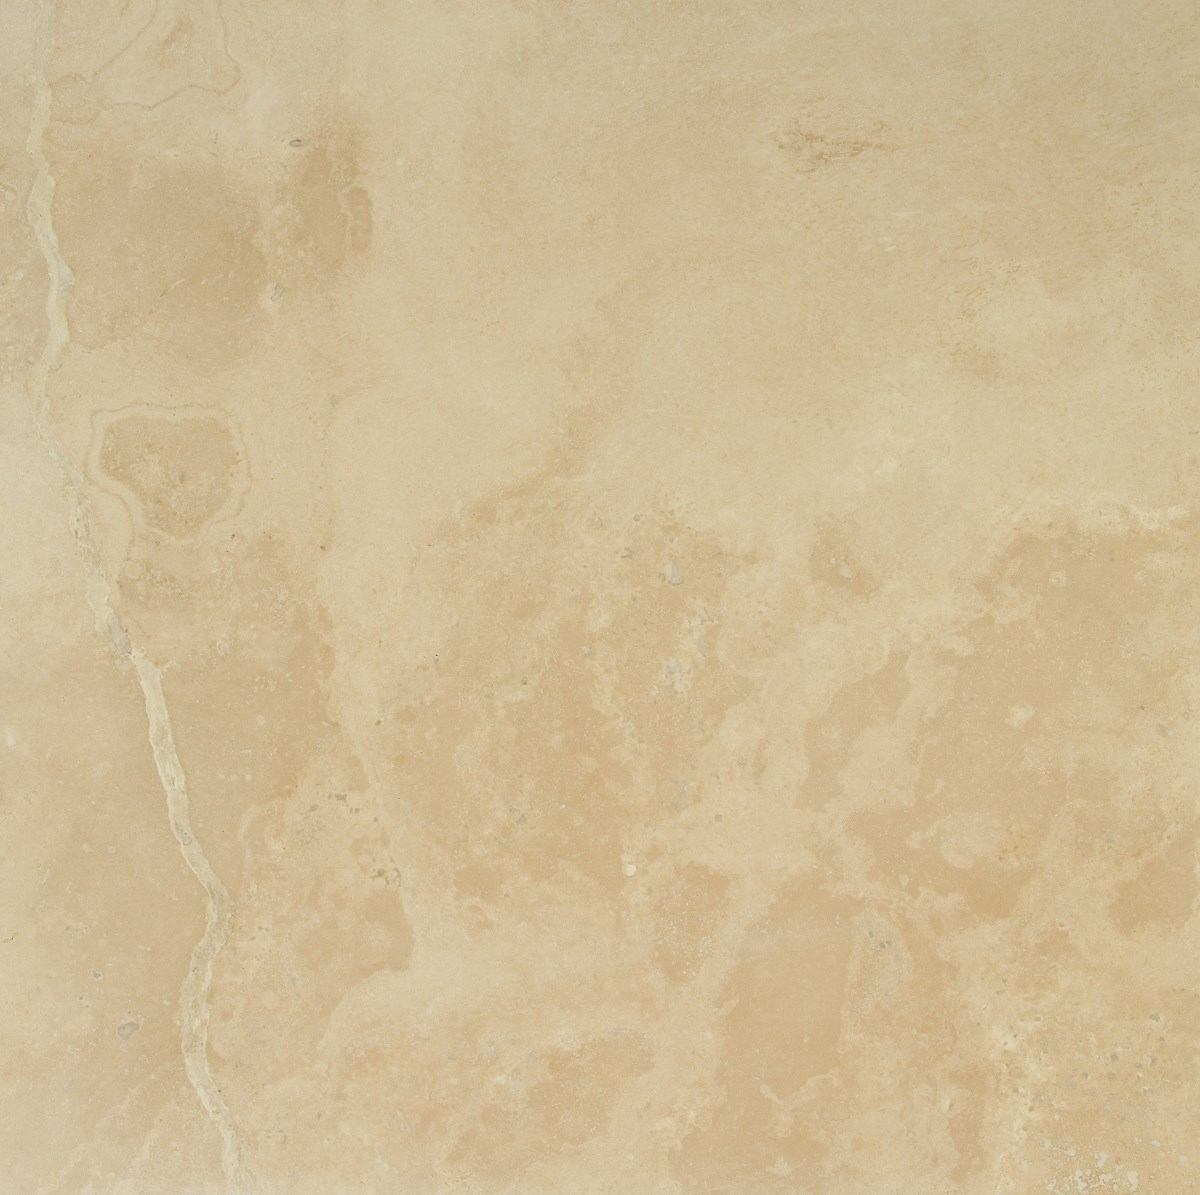 Pisos de marmol travertino veracruz 40x40 290 00 m2 mate - Piso marmol blanco ...